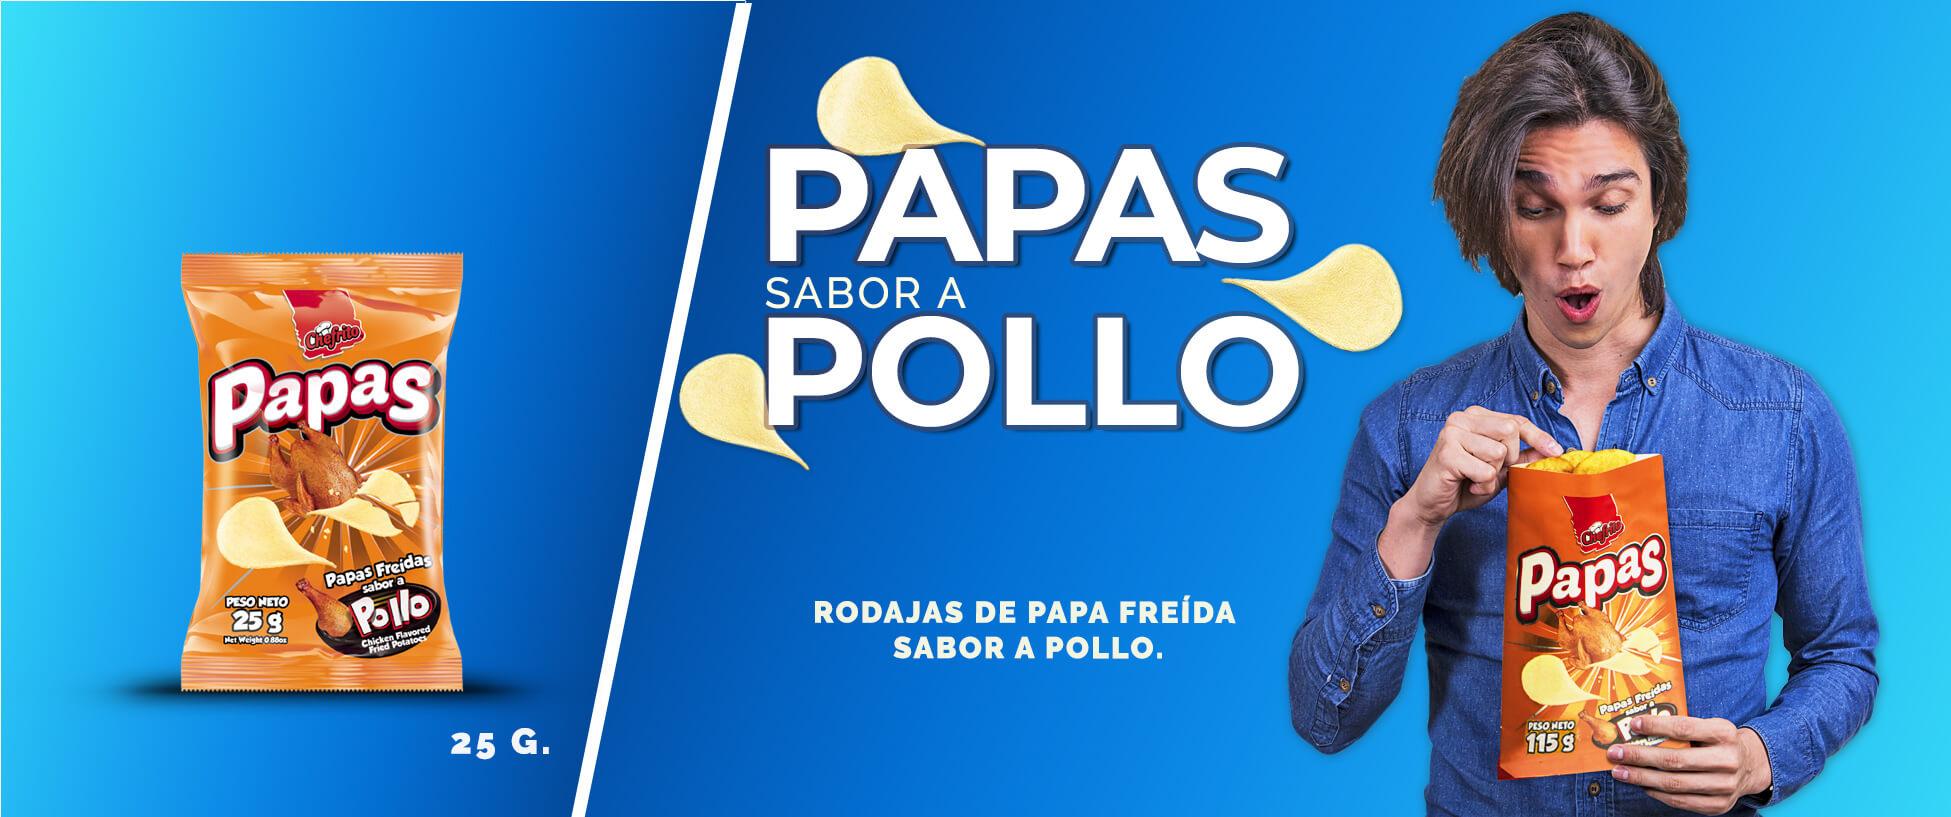 Papas 4